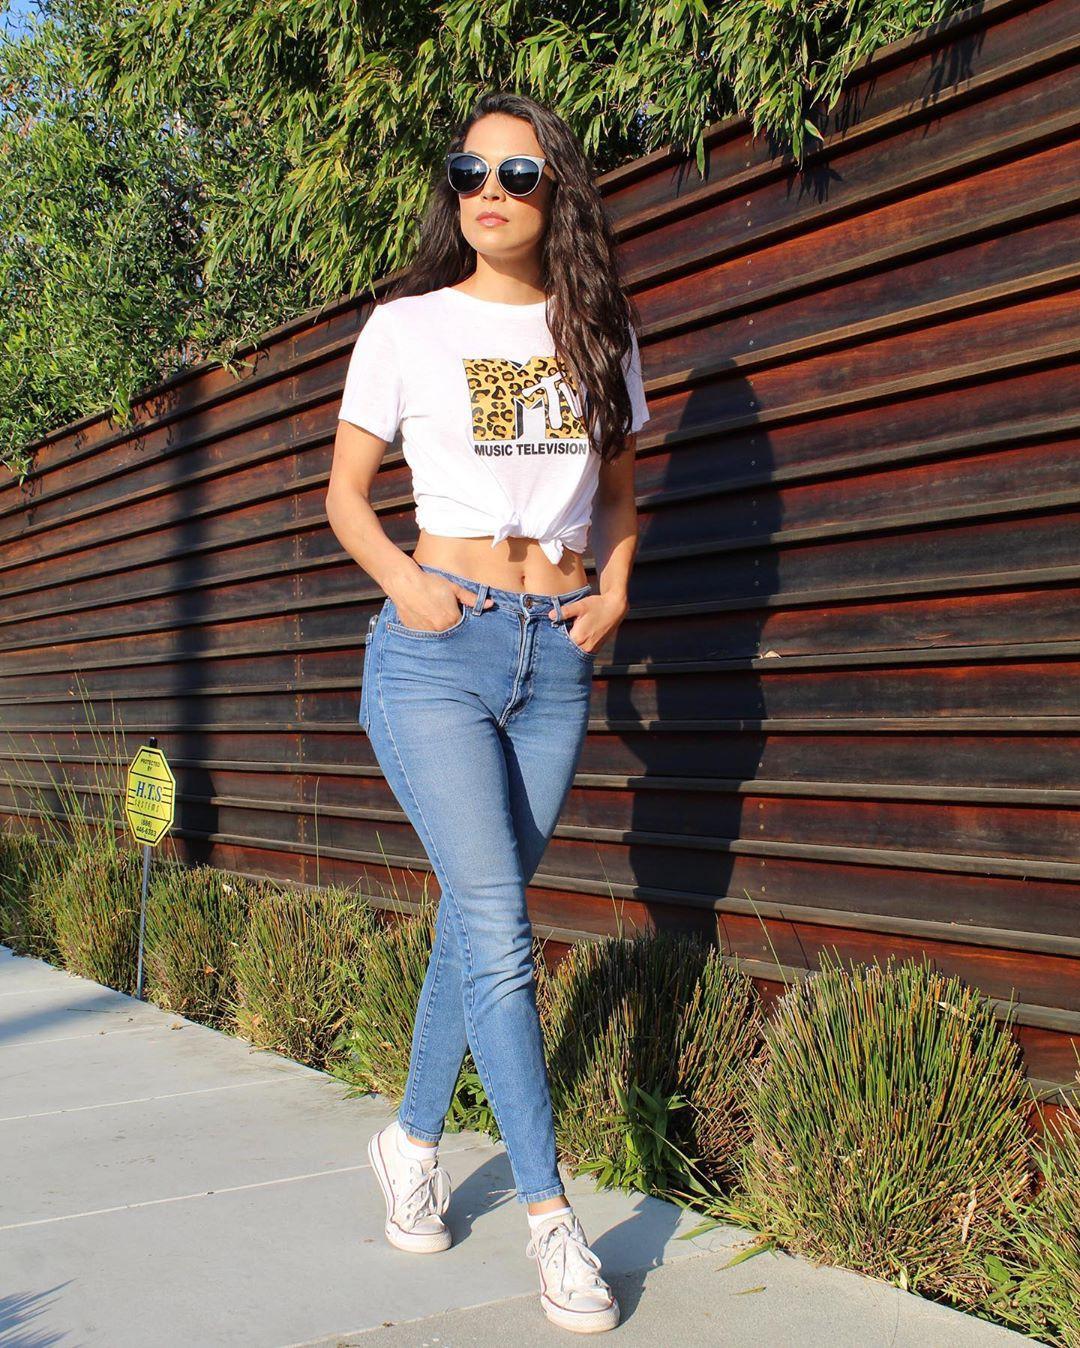 White and blue denim, jeans, eyewear